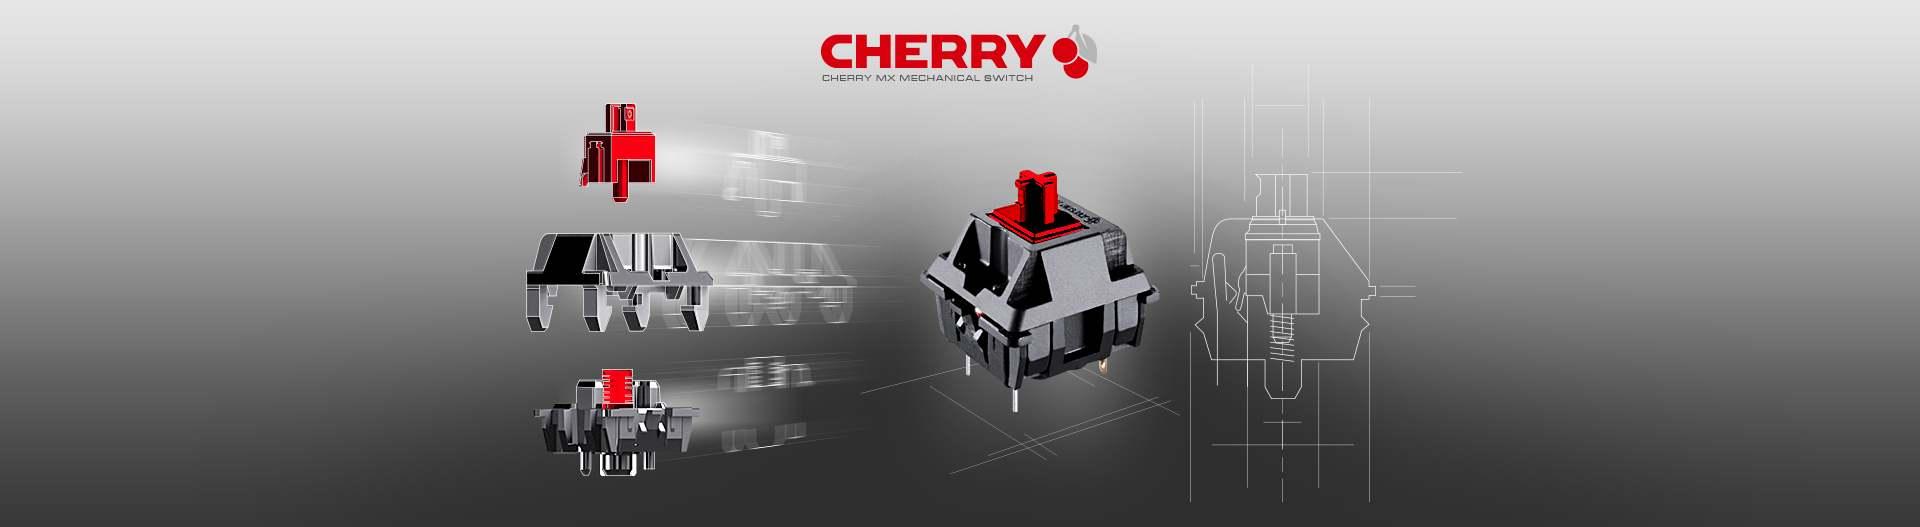 COUGAR PURI - Cherry MX Mechanical Gaming Keyboard - COUGAR